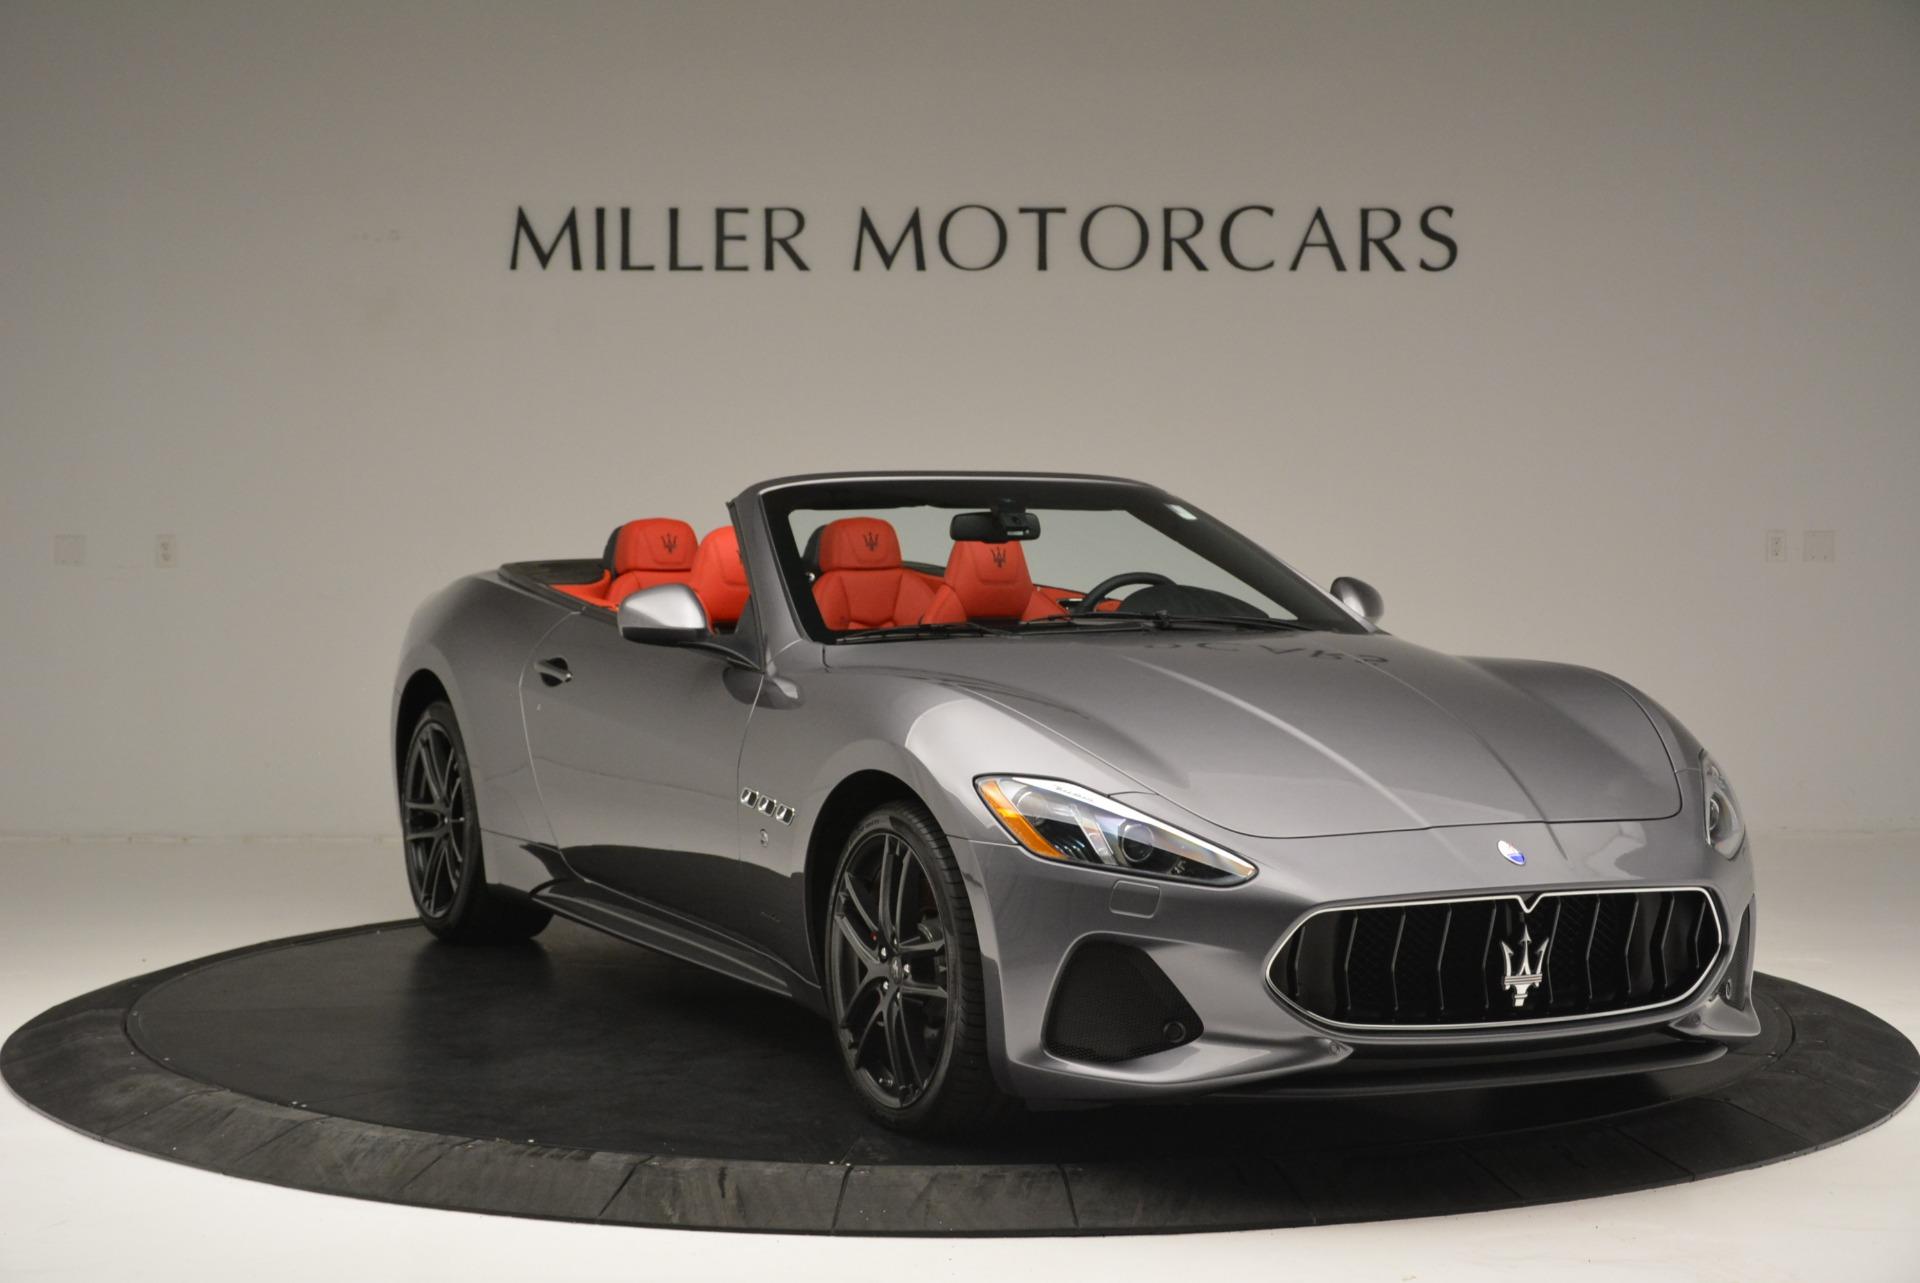 New 2018 Maserati GranTurismo Sport Convertible For Sale In Westport, CT 2182_p11